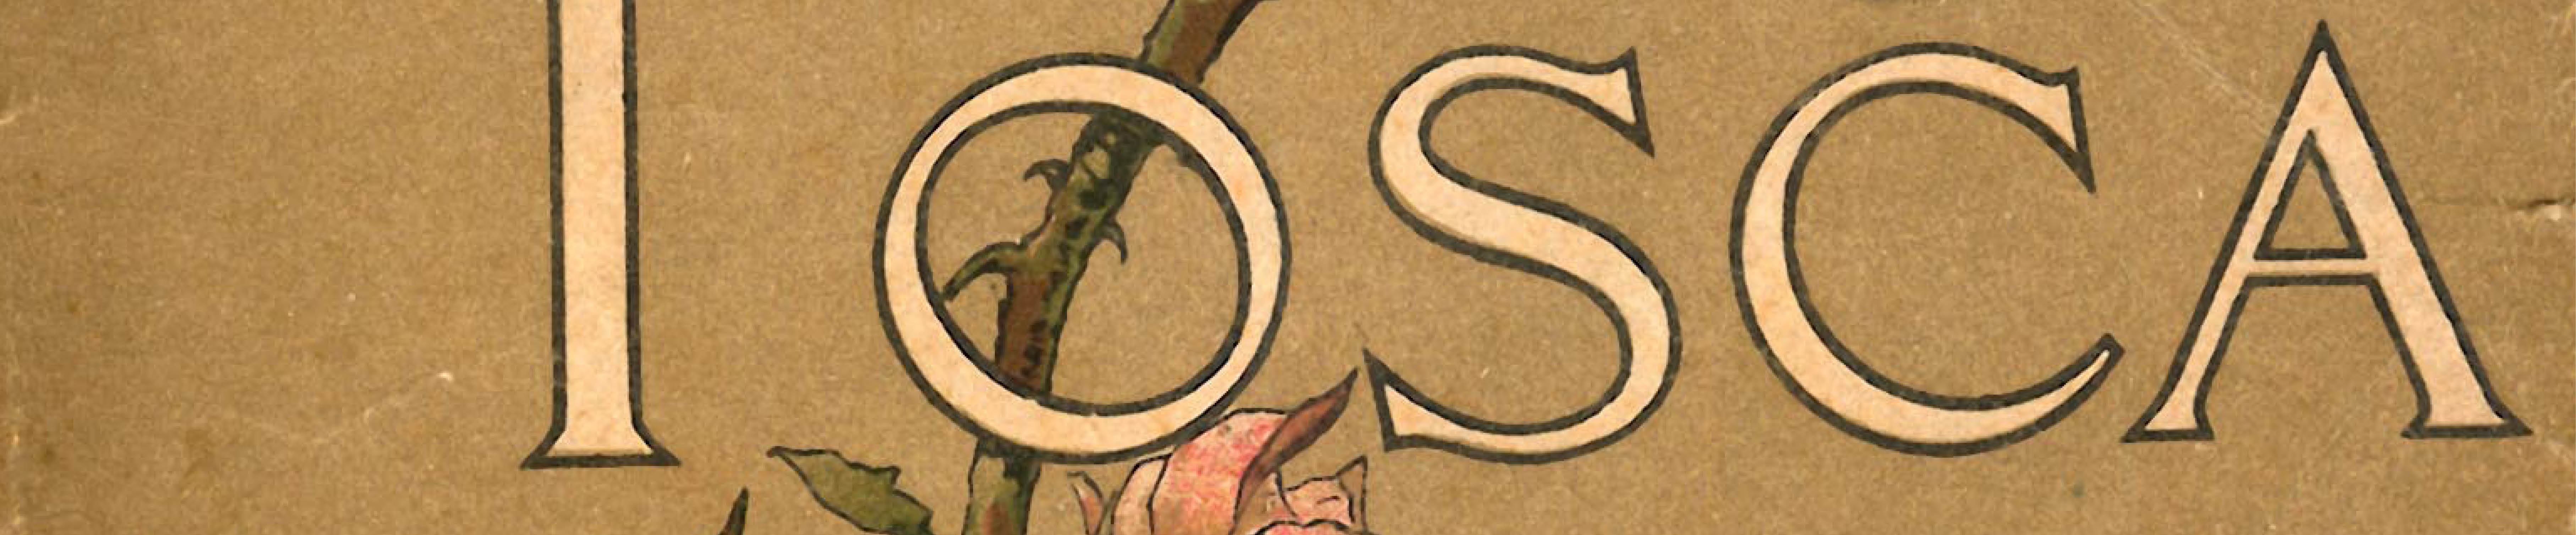 Tosca : report en mai